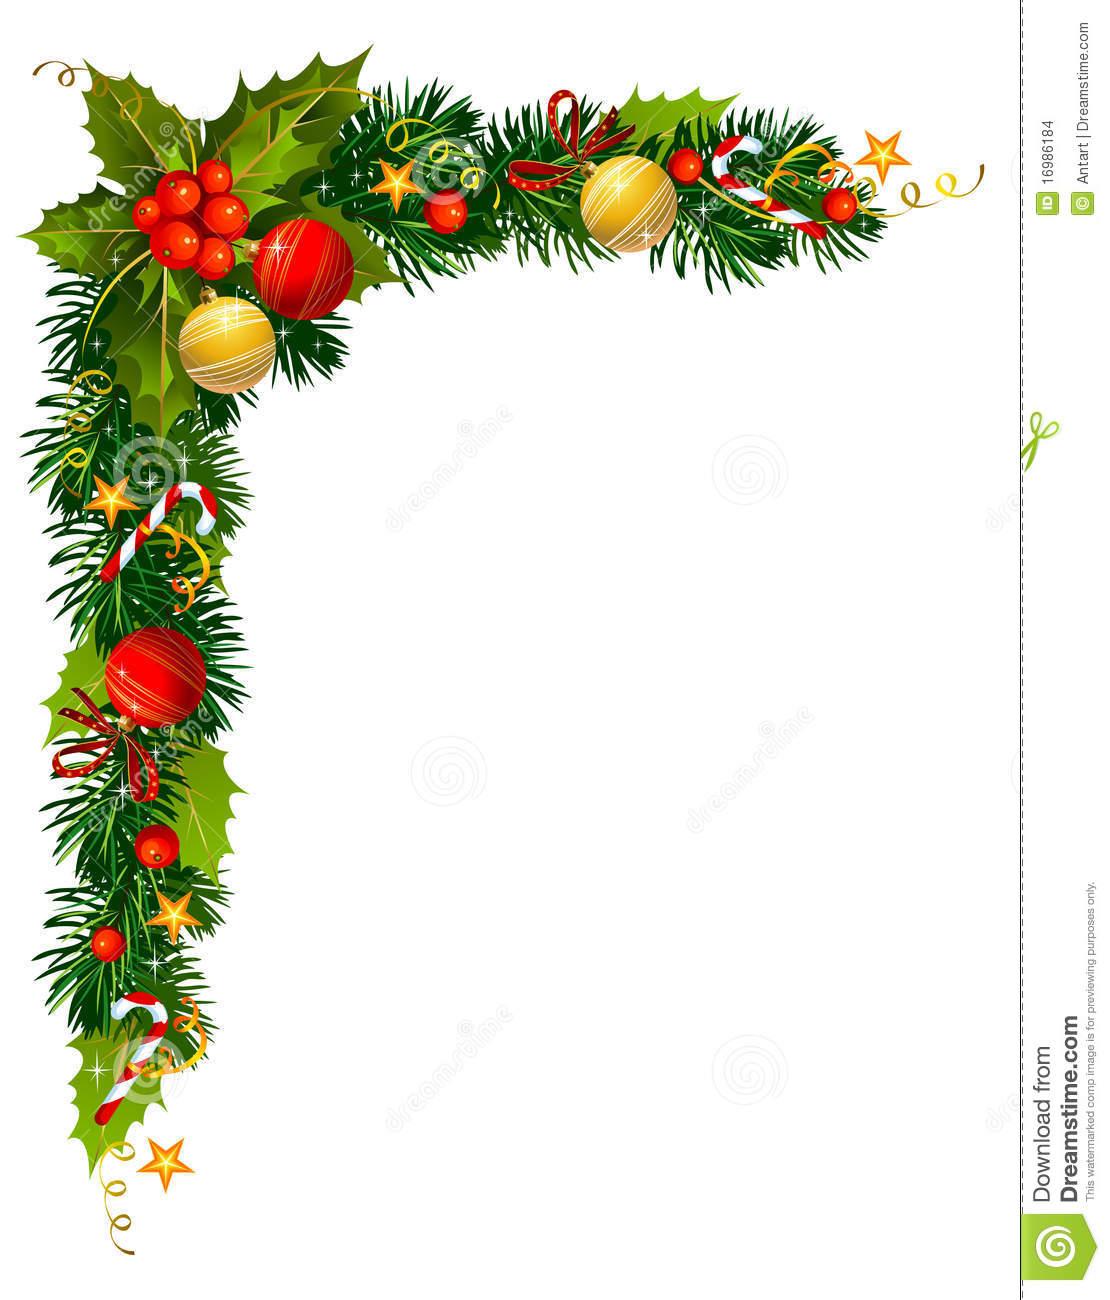 Christmas Corner Border Clipart - Clipart Kid